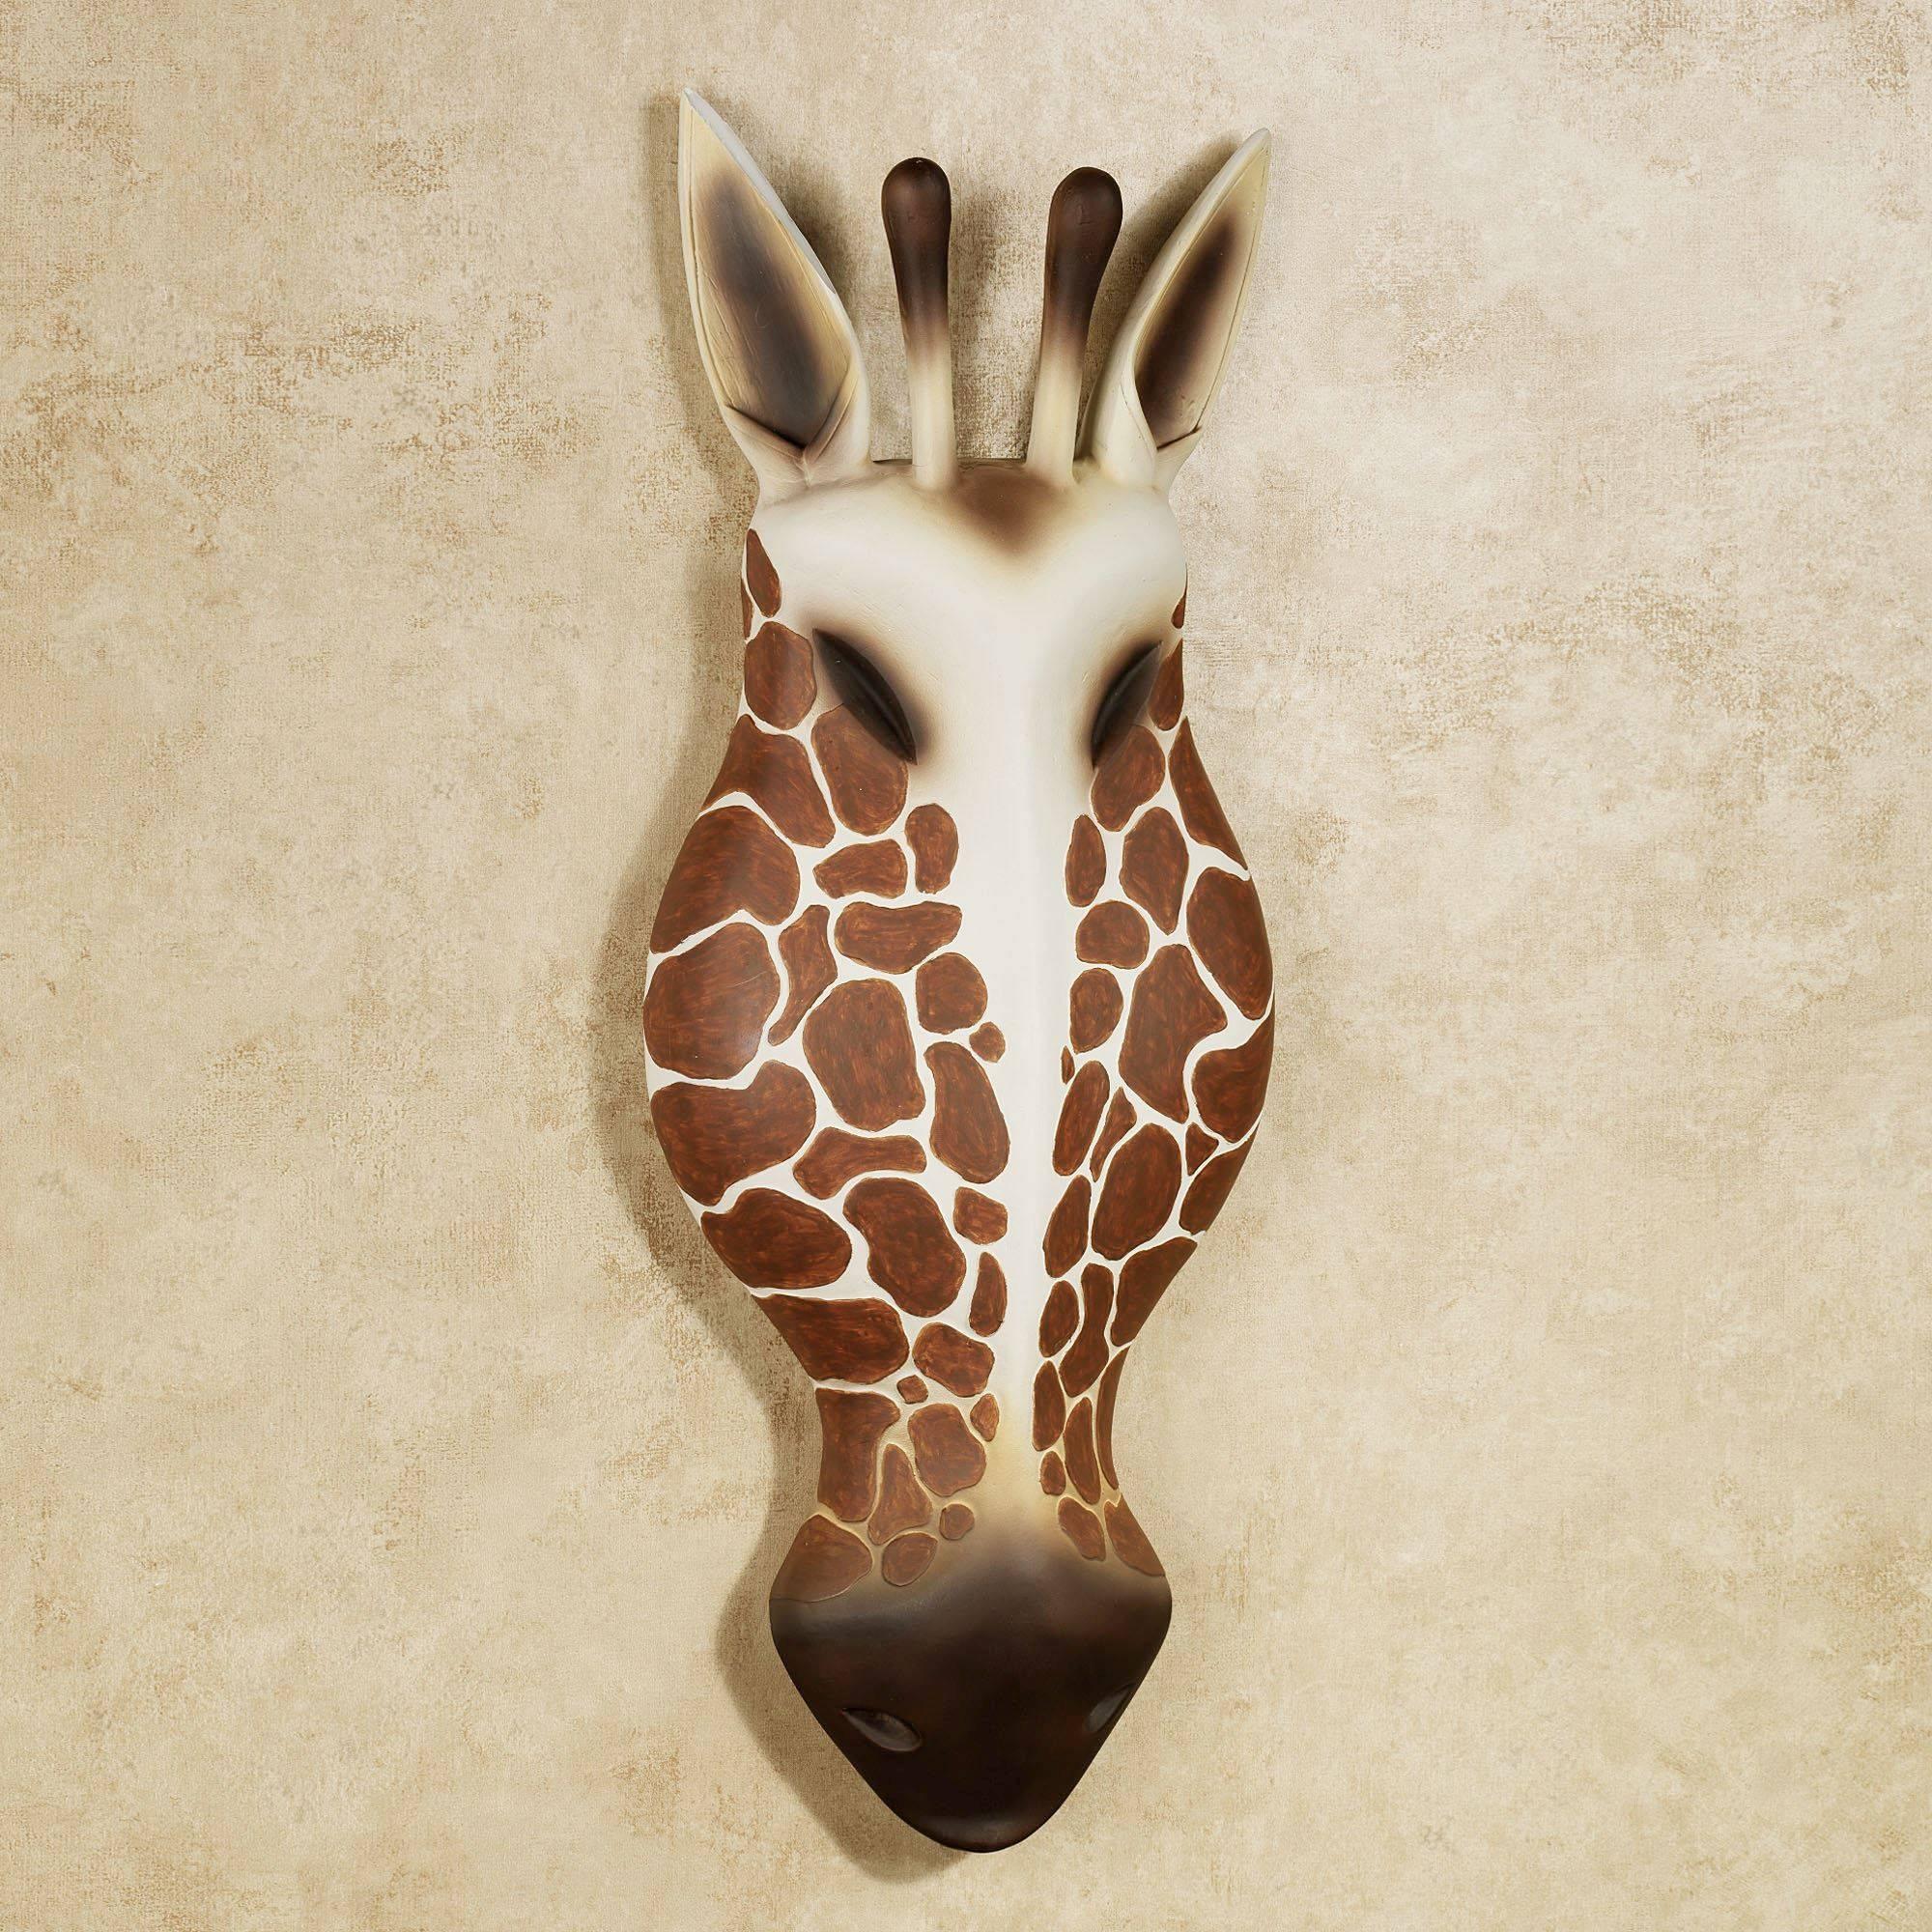 Resin Giraffe Head Wall Art Intended For Latest Giraffe Metal Wall Art (Gallery 4 of 20)